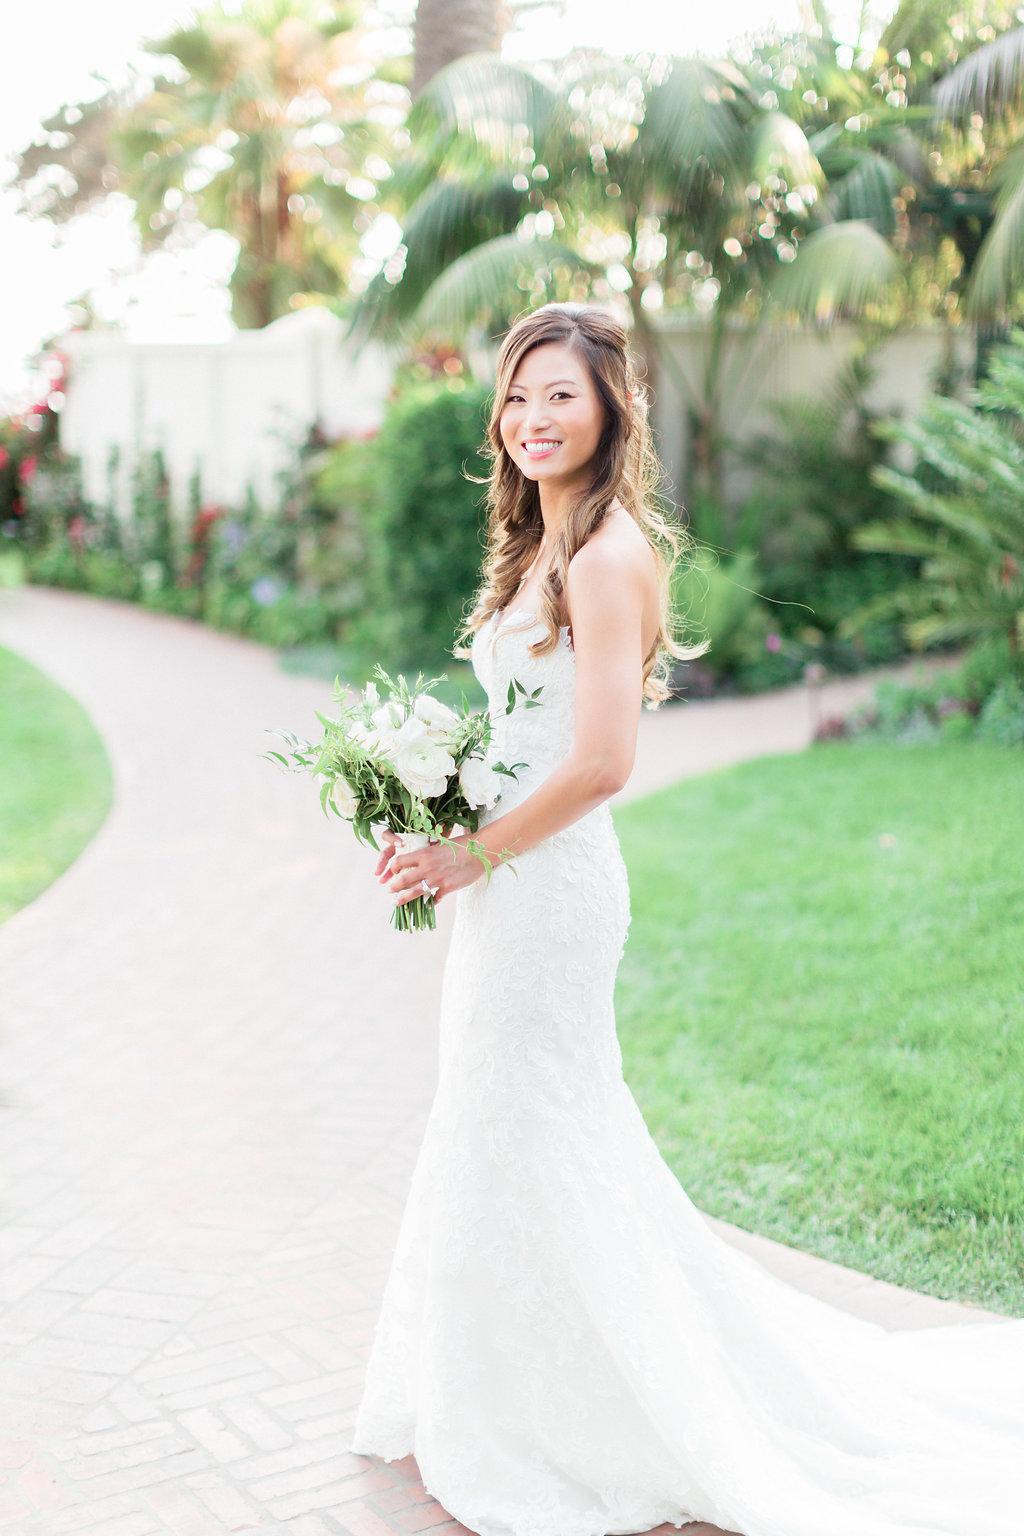 santa-barbara-elopement-elope-wedding-planner-coordinator-day-of-four-seasons-biltmore-ocean-front-view-garden-pink-white-green-montecito-black-tie (9).jpg